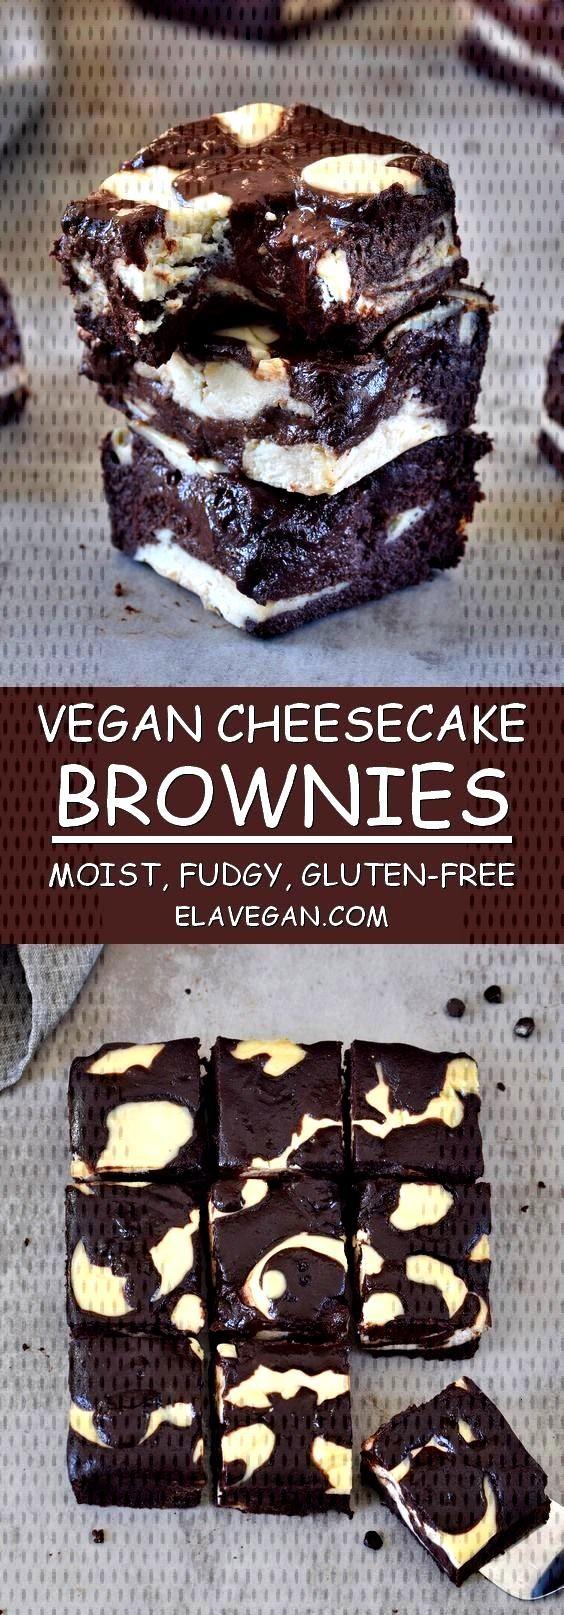 Vegan Cheesecake Brownies | Fudgy, Gluten-Free Recipe - Elavegan - These vegan cheesecake brownies